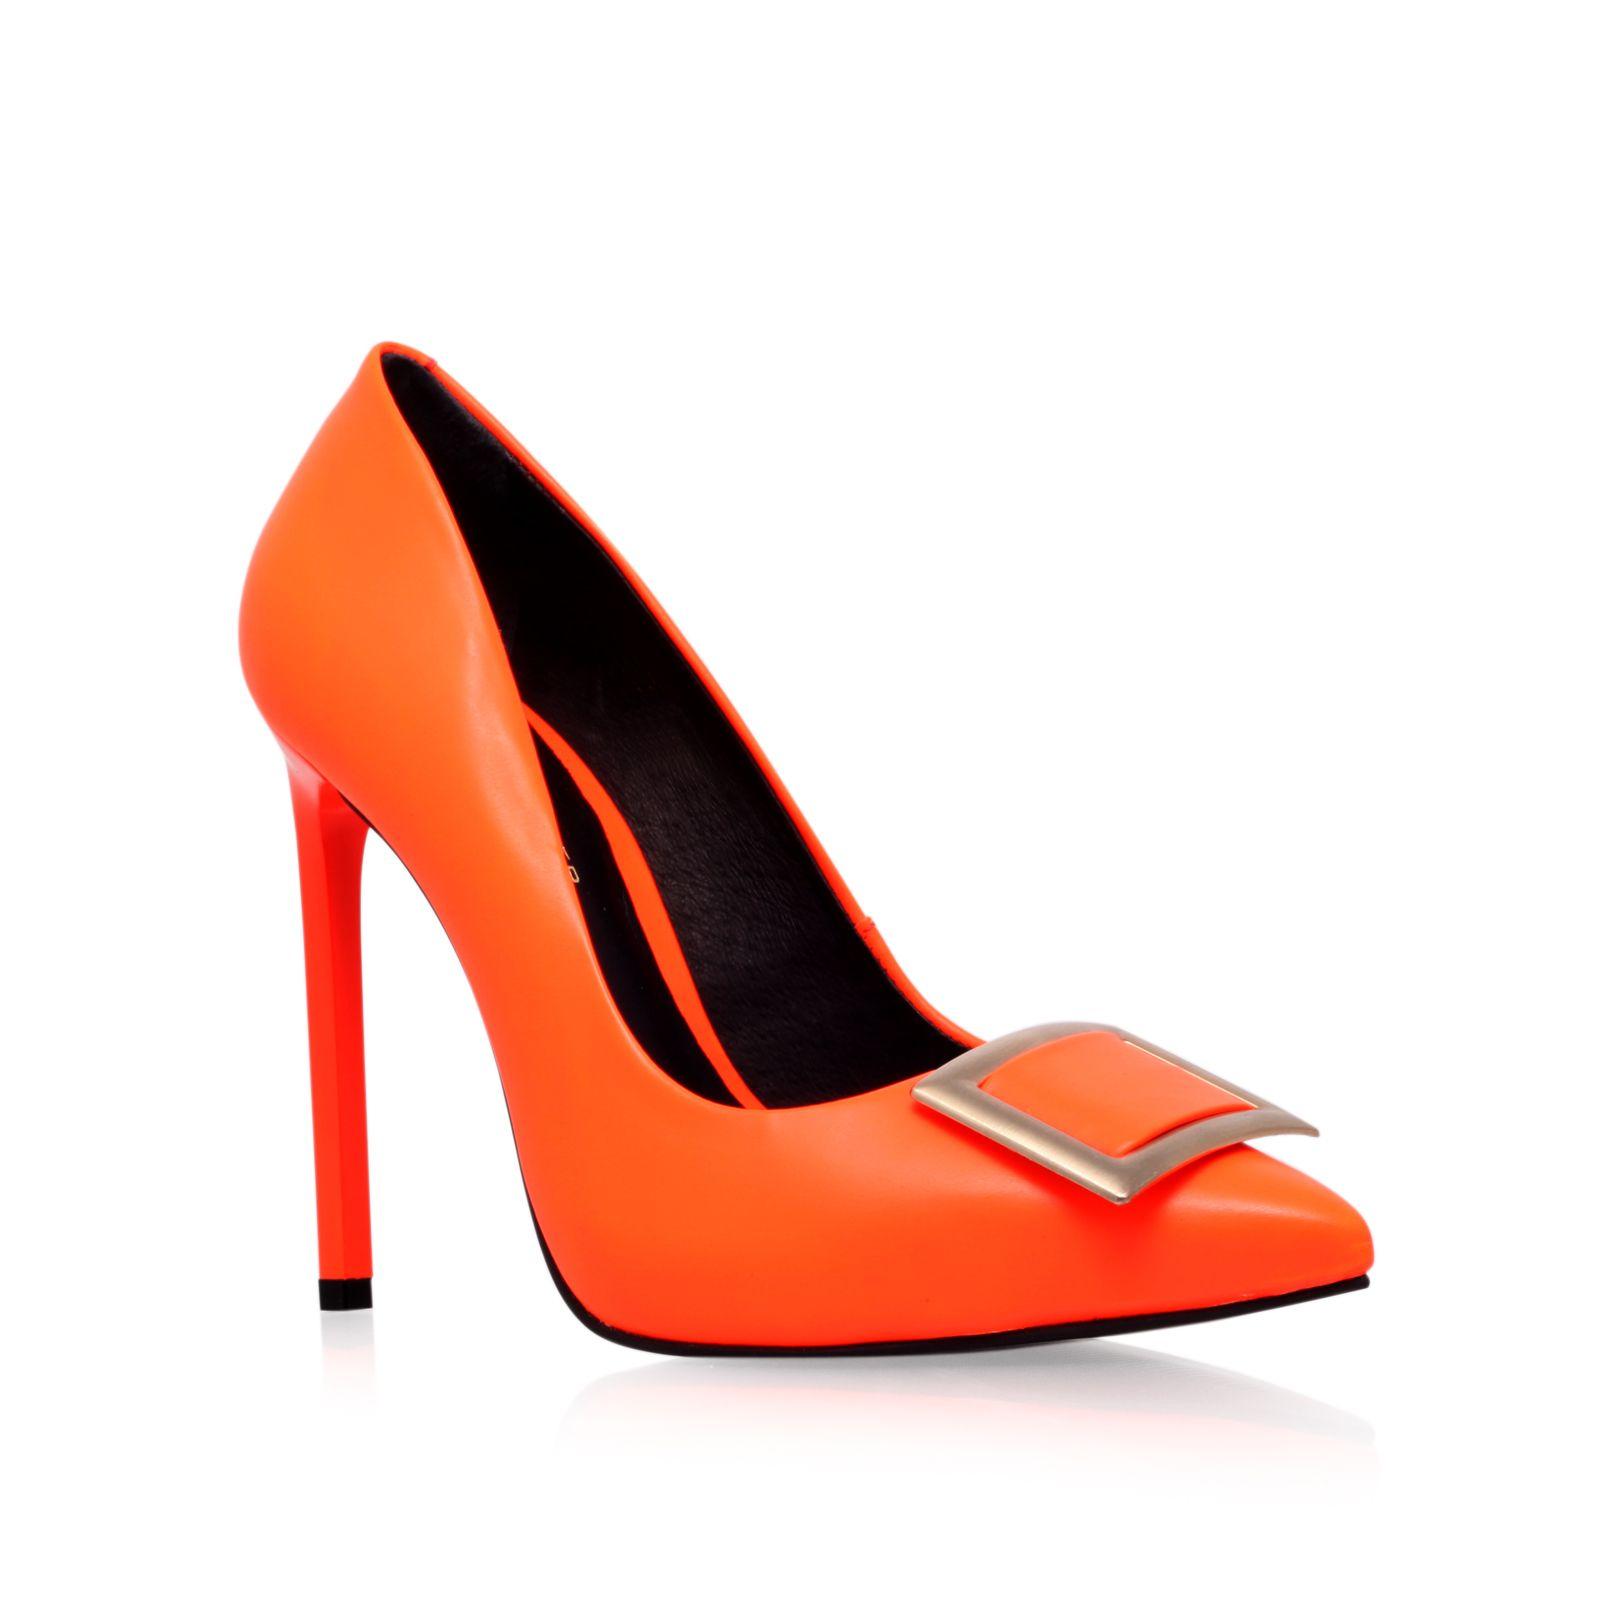 kg by kurt geiger bryony high heel court shoes in orange lyst. Black Bedroom Furniture Sets. Home Design Ideas